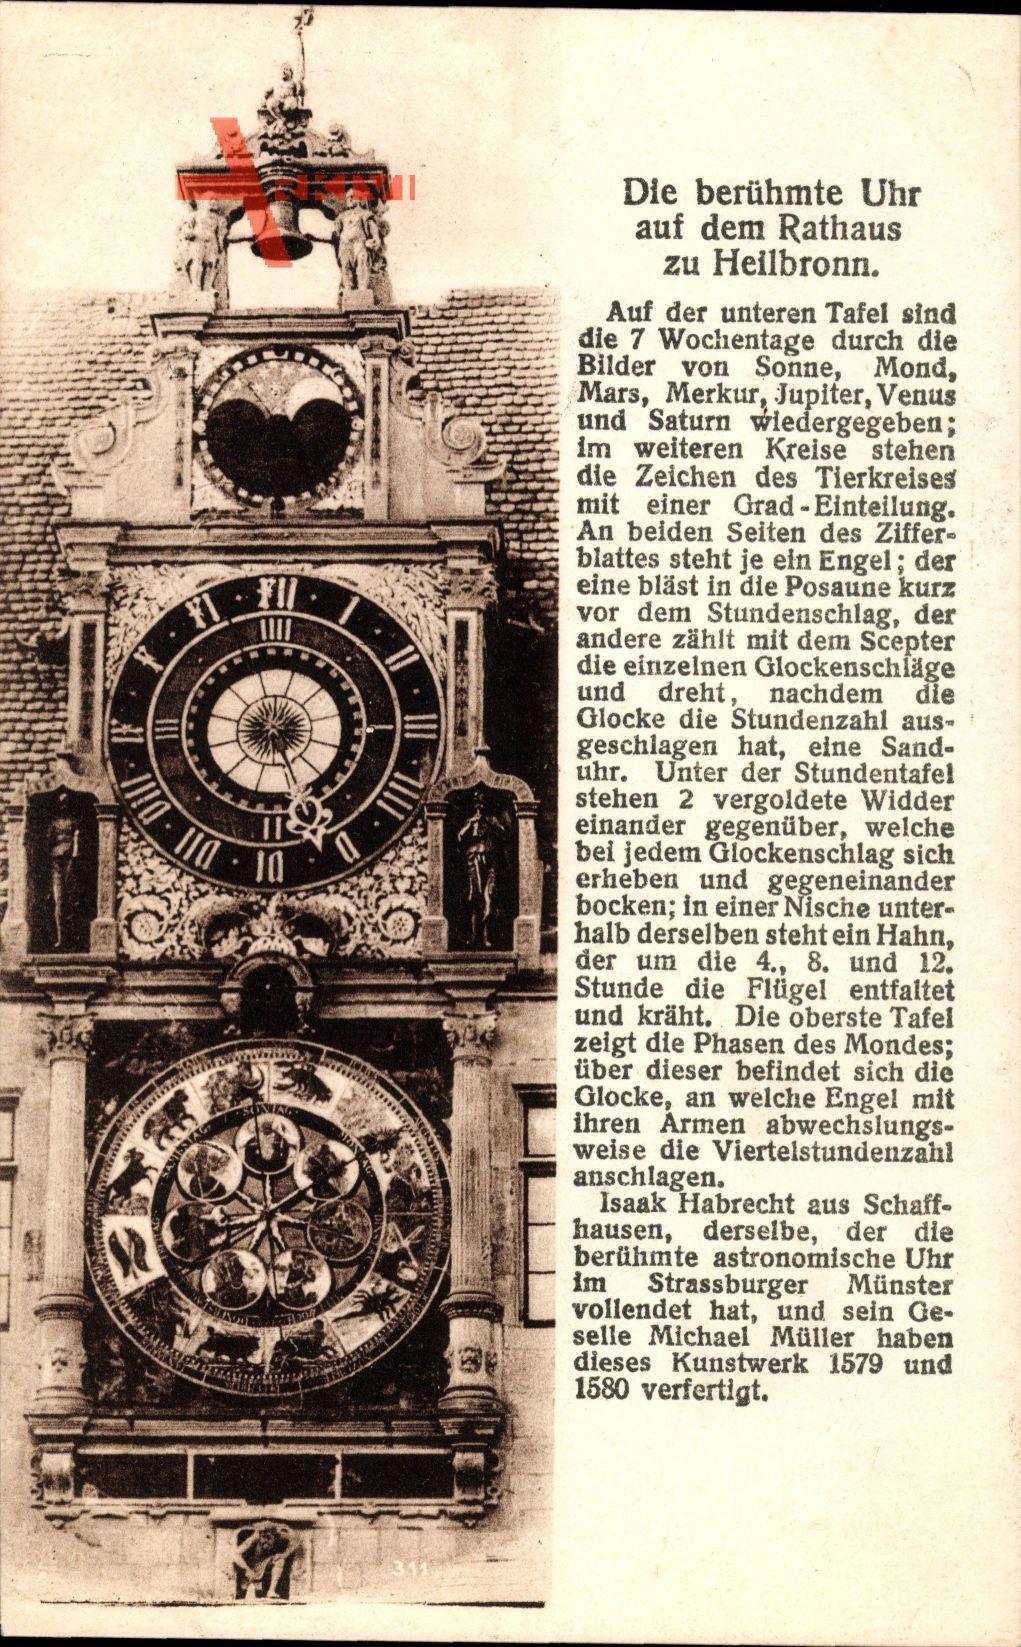 Heilbronn, die berühmte Uhr auf dem Rathaus zu Heilbronn